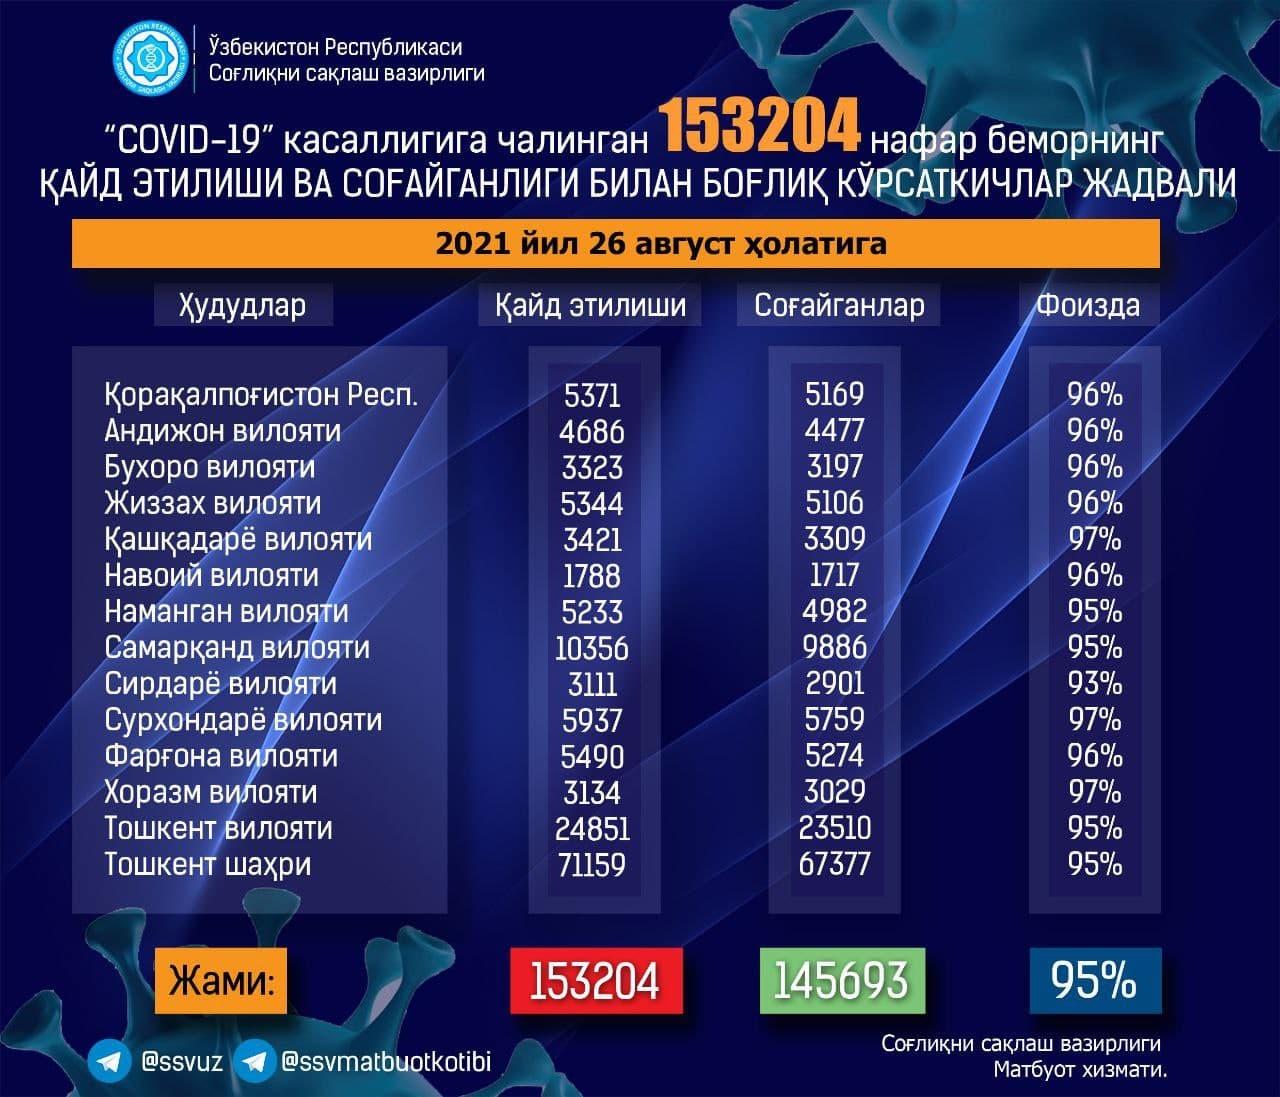 Стало известно, сколько узбекистанцев заразилось коронавирусом за сутки — статистика